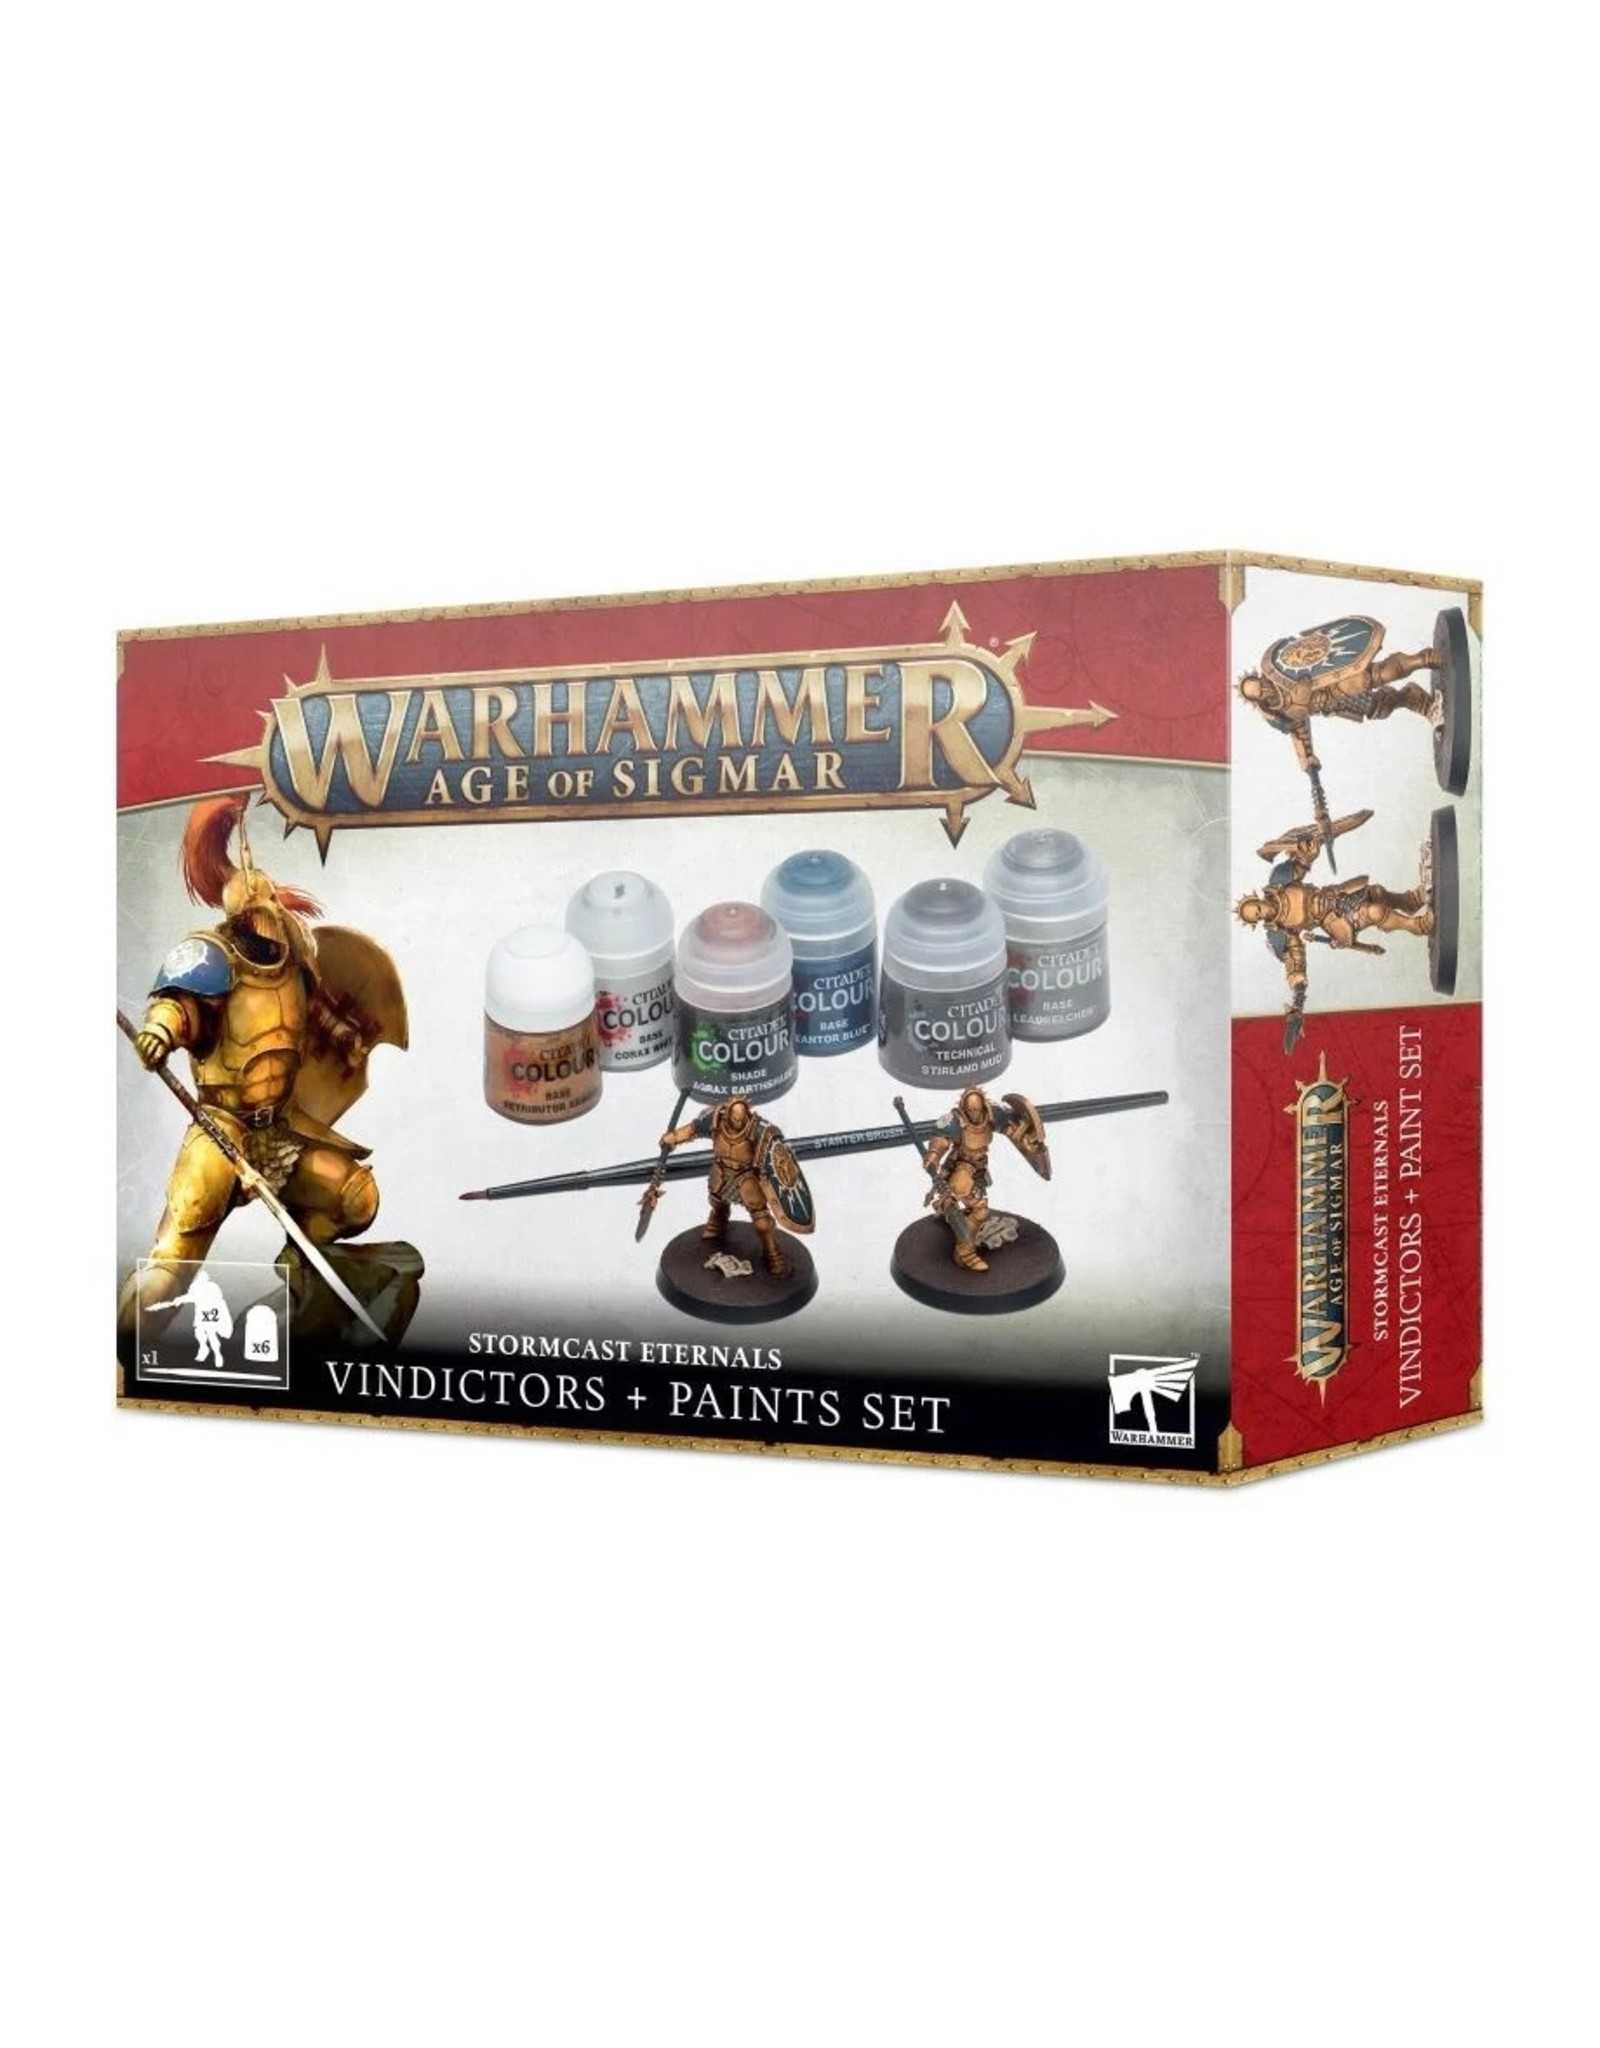 Games-Workshop STORMCAST ETERNALS + PAINT SET (VINDICTORS)